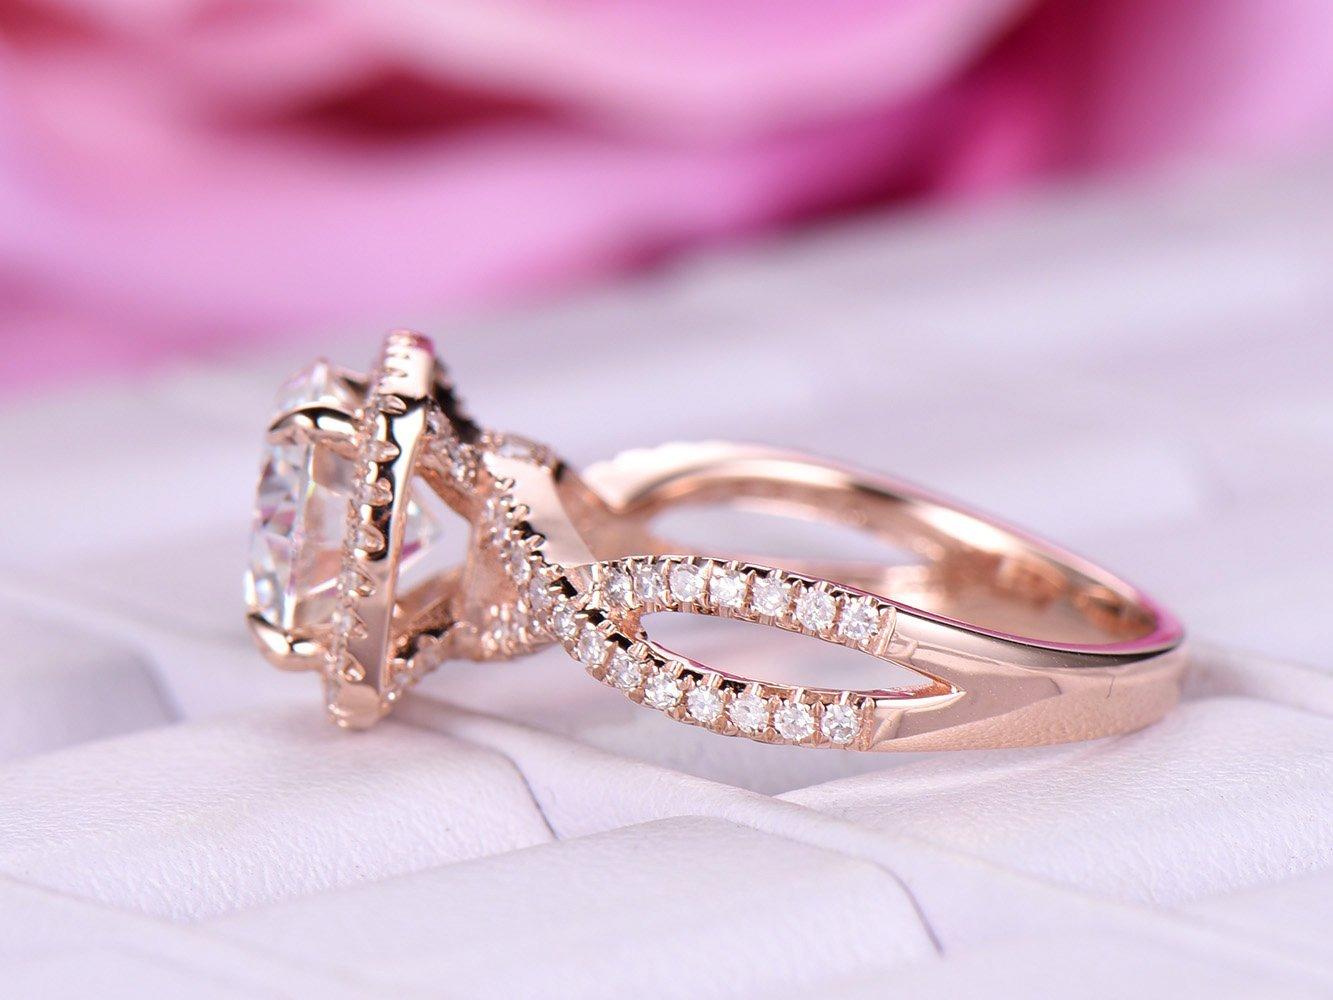 Amazon.com: Round FB Moissanite Engagement Ring Pave Diamond ...